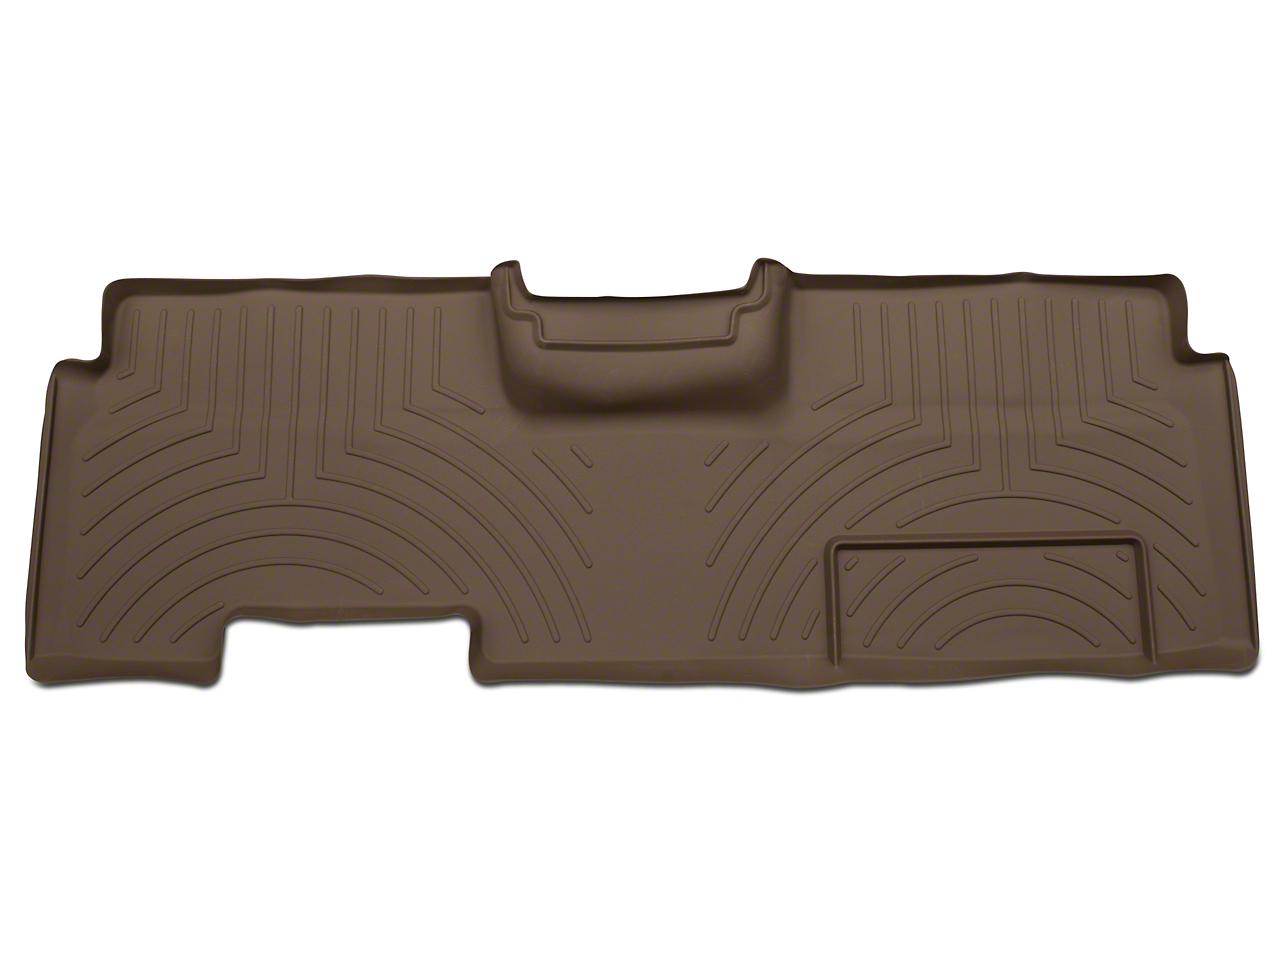 Weathertech DigitalFit Rear Floor Liner - Tan (09-14 F-150 SuperCab, SuperCrew)